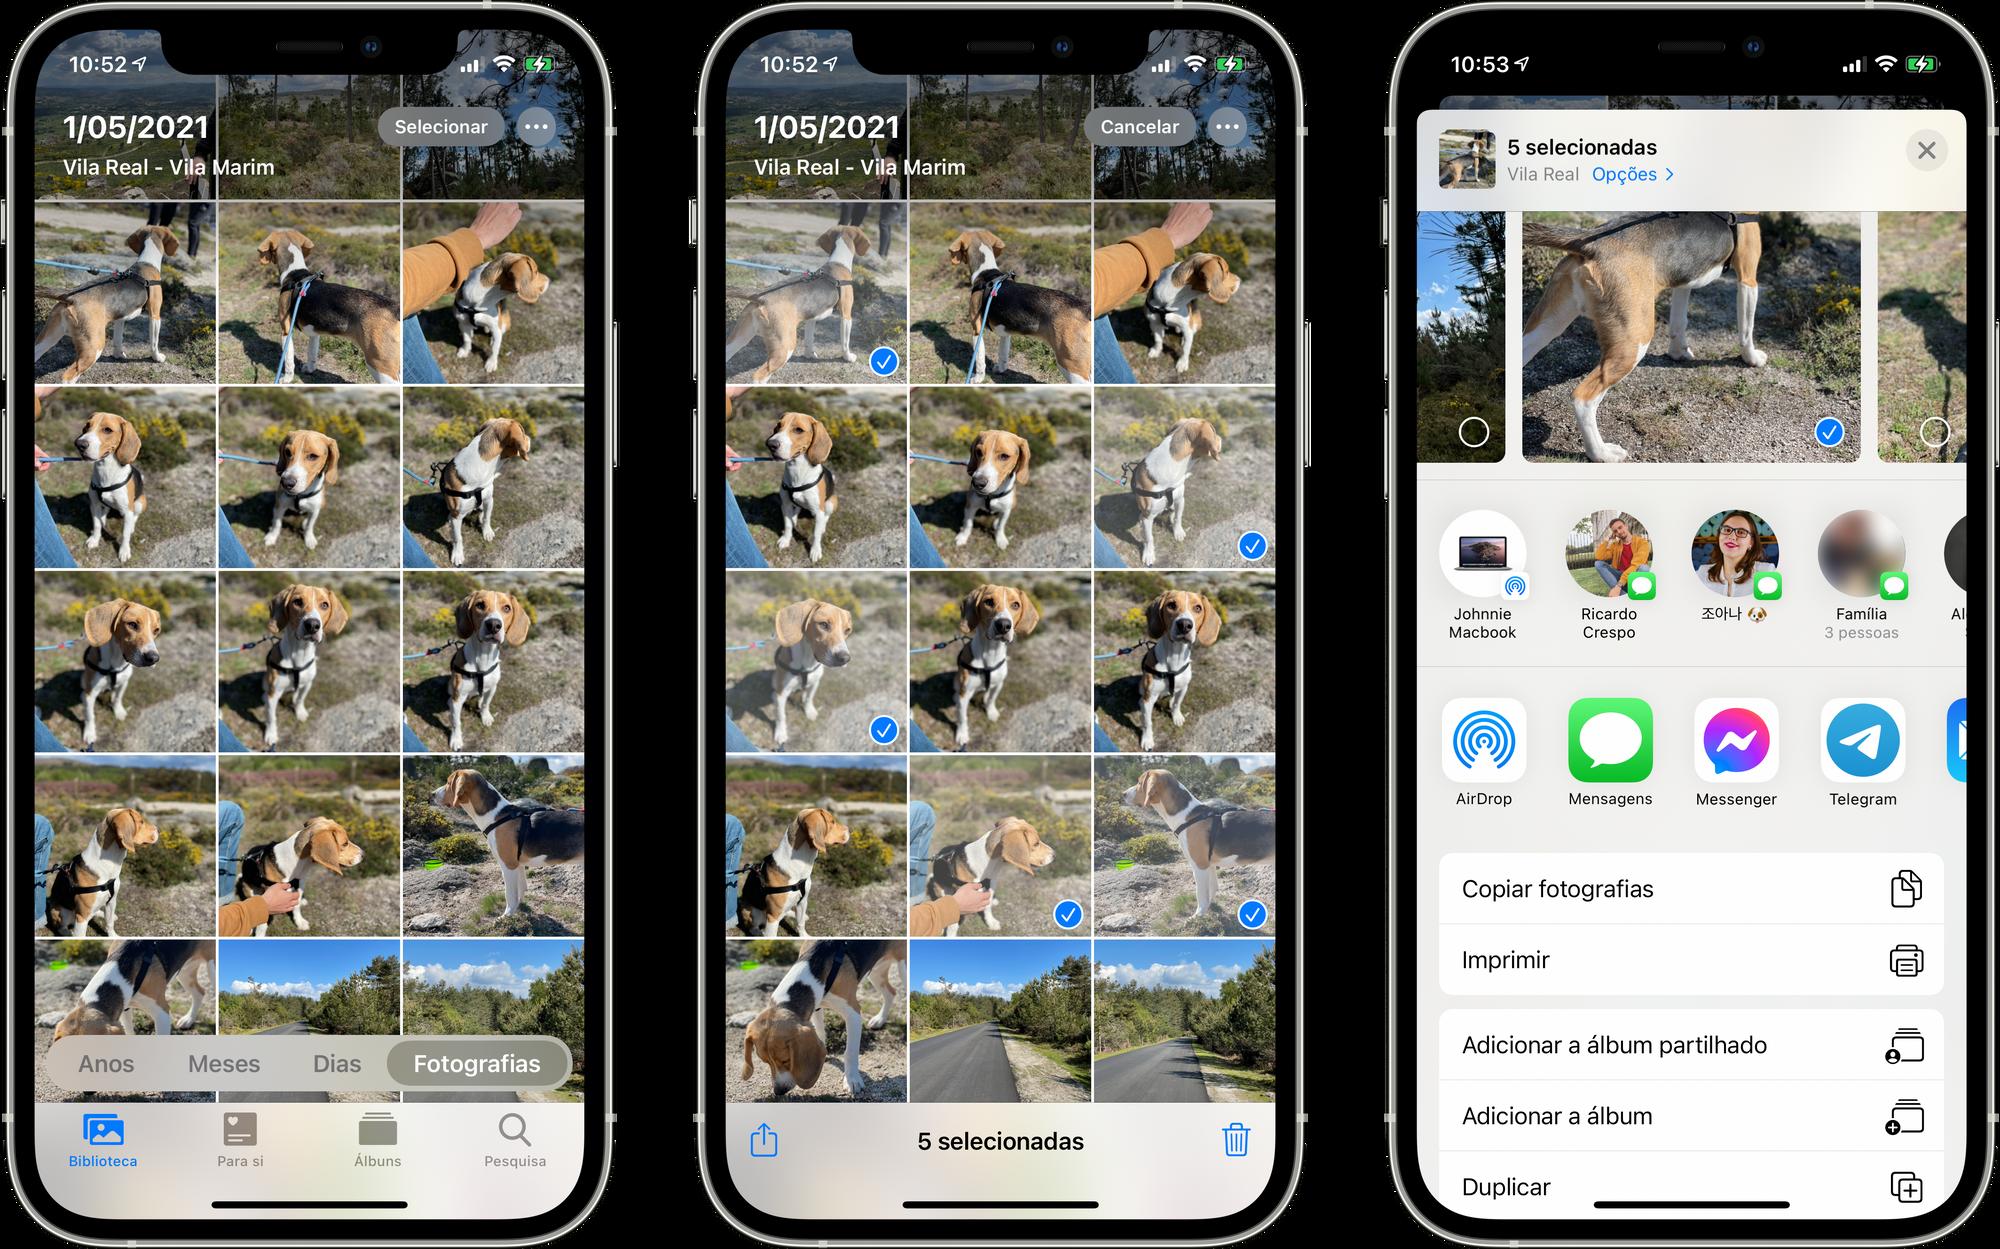 Imprimir fotografias através do iPhone ou iPad